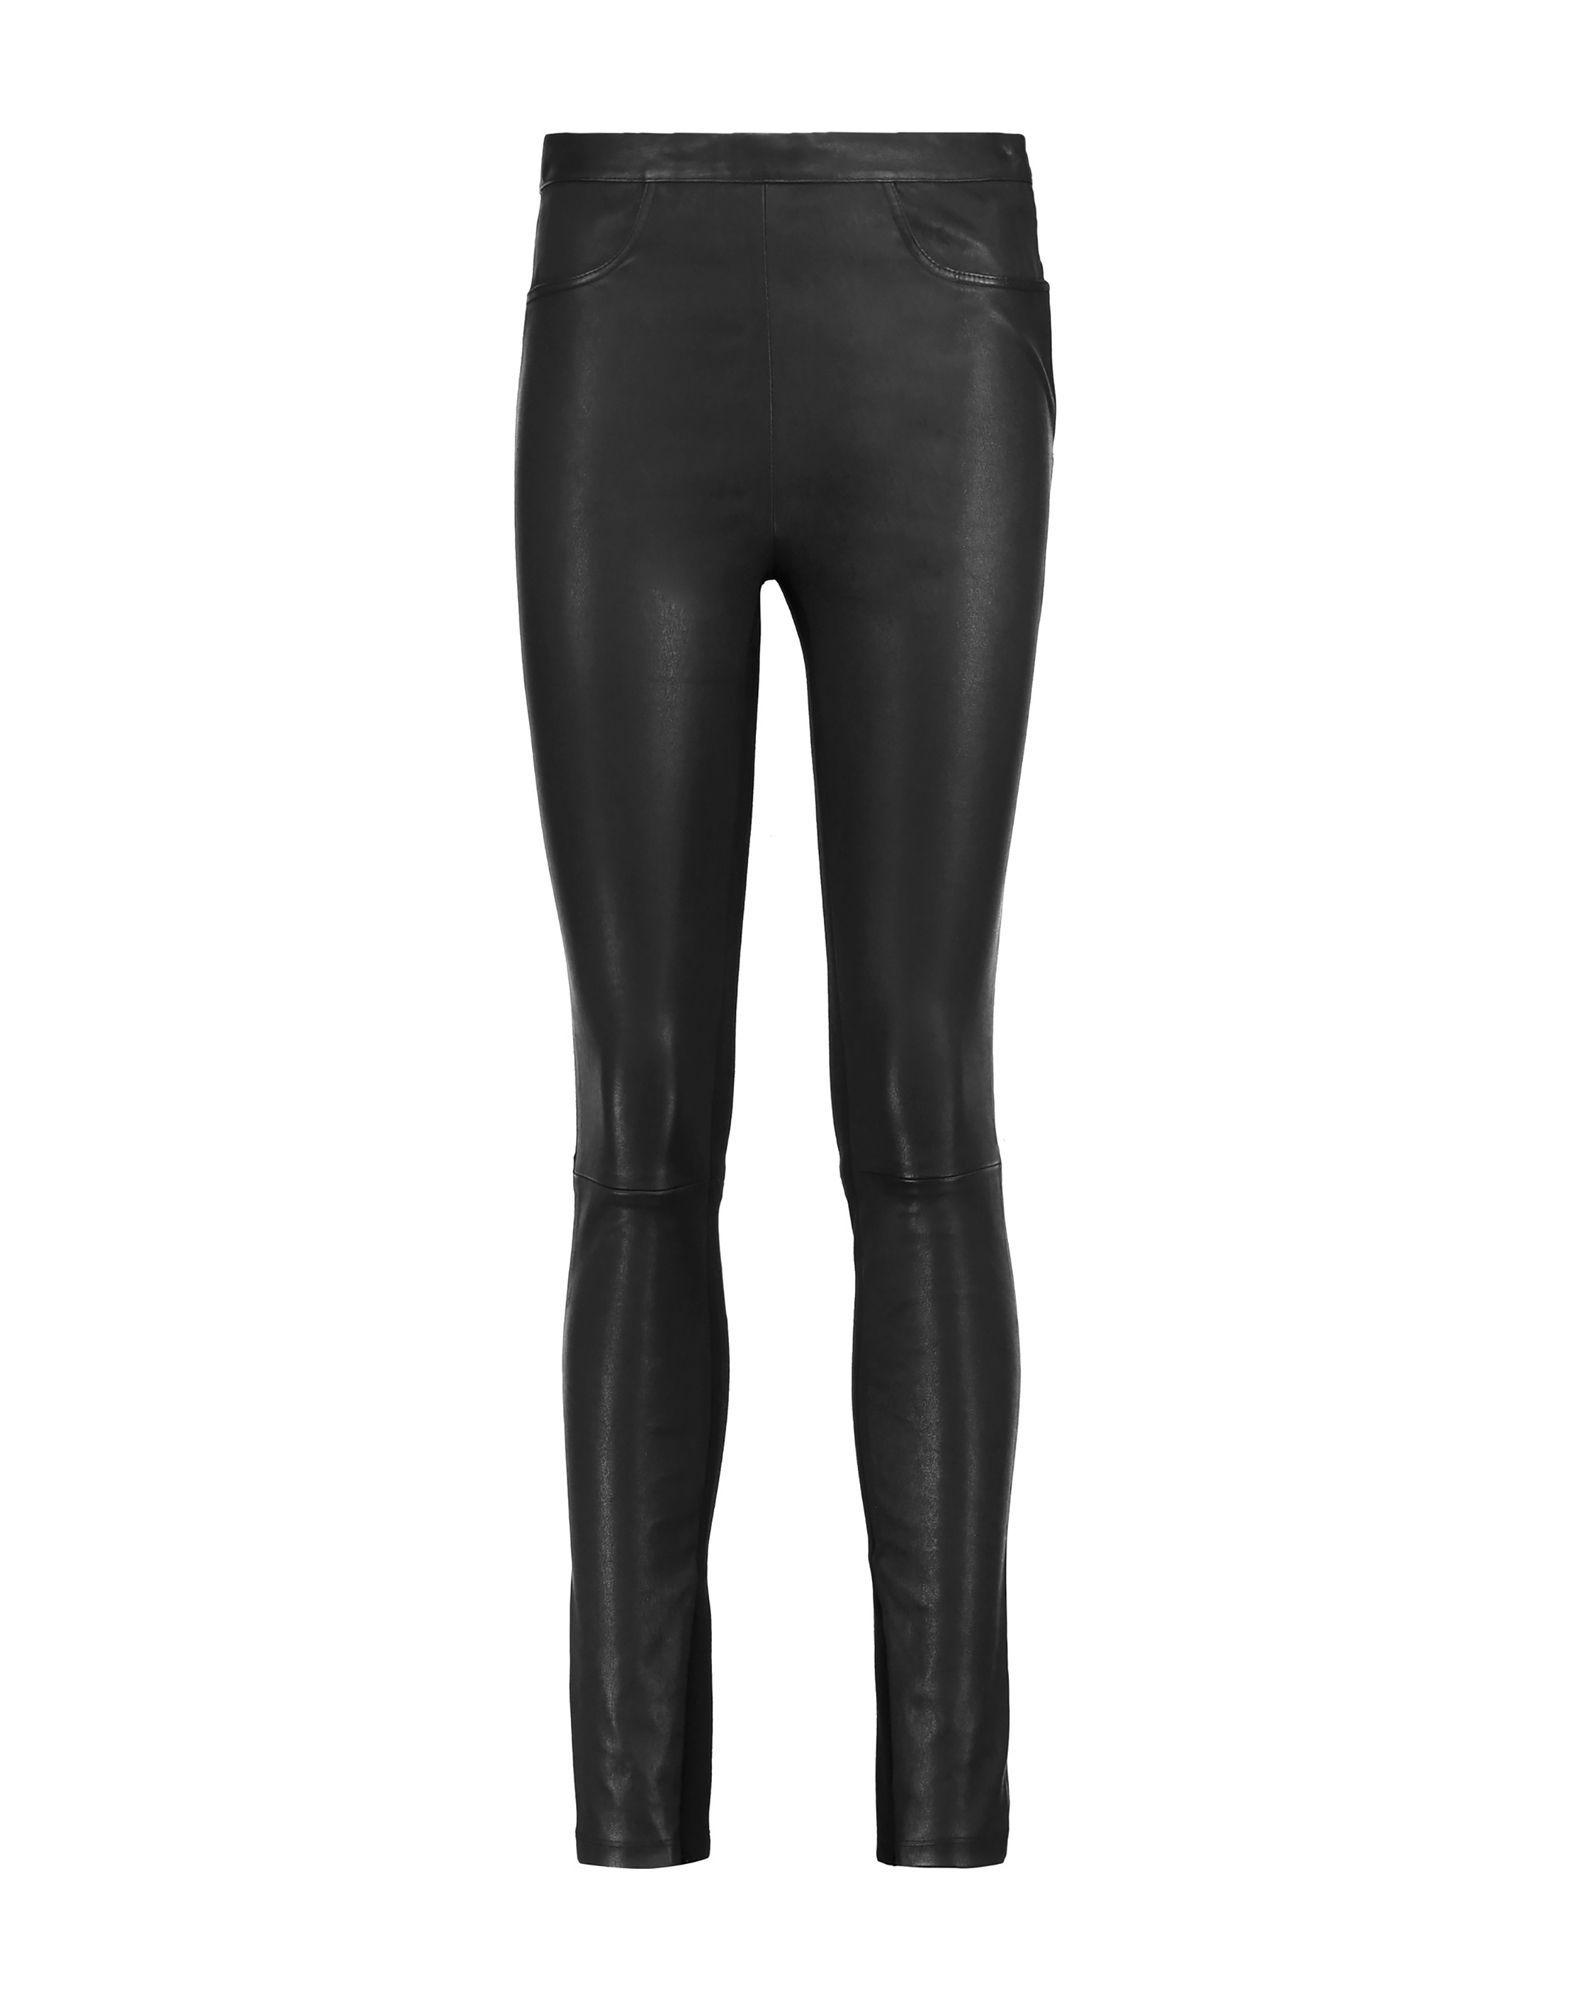 Maje Black Lambskin Leather Trousers